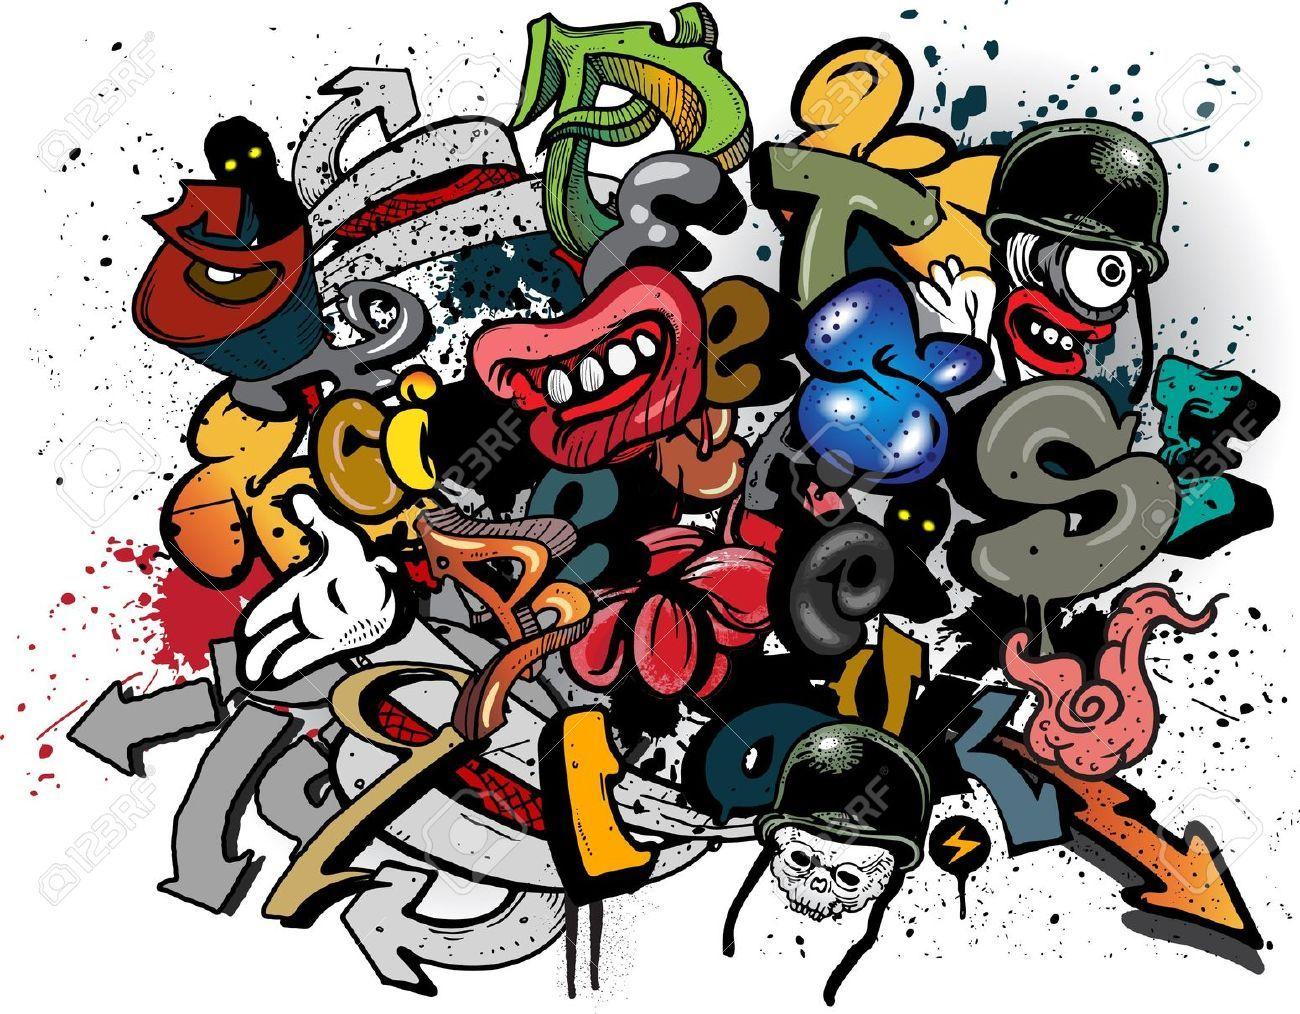 Graffiti Dibujos Animados Imagenes De Archivo Vectores Graffiti